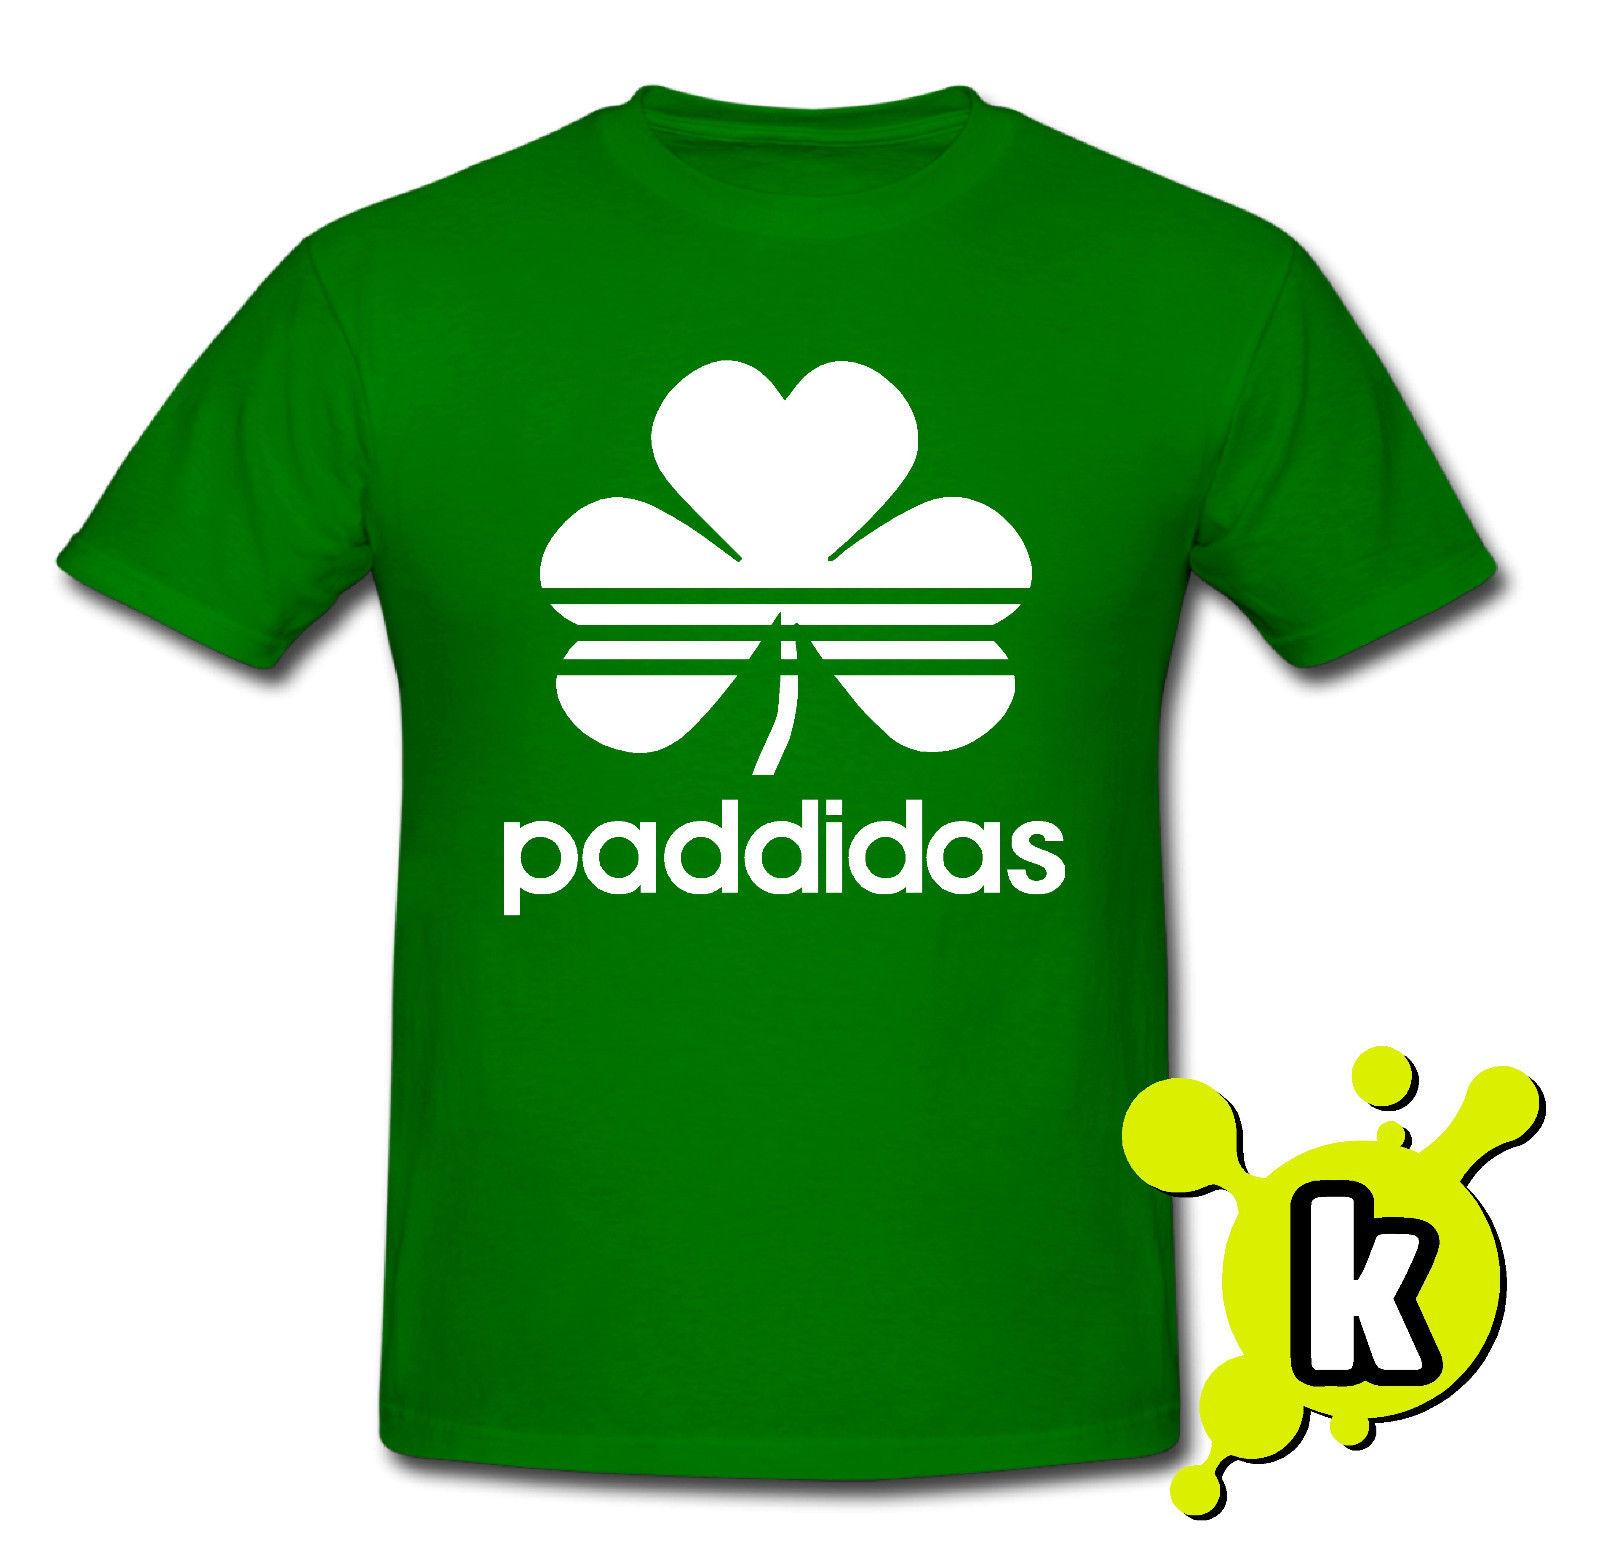 dc403a540 Paddidas Irish Parody Funny Shamrock St. Patricks Paddys Day T Shirt Best  Funny Shirts Funny Print Shirts From Down2lift, $11.01| DHgate.Com